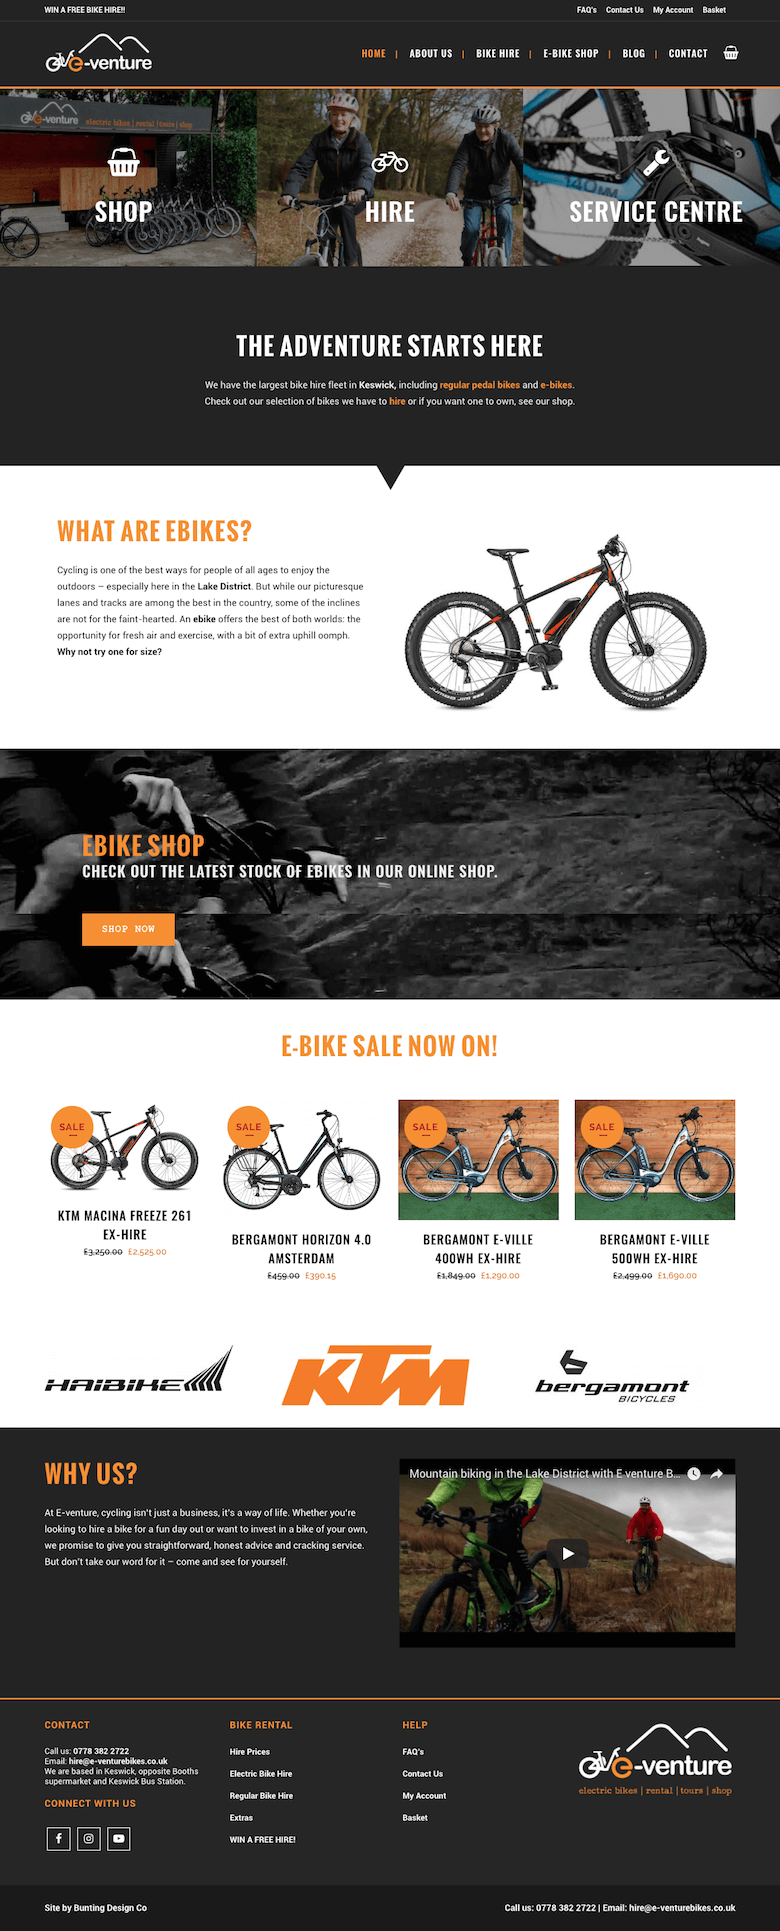 E-Venture ebike website design